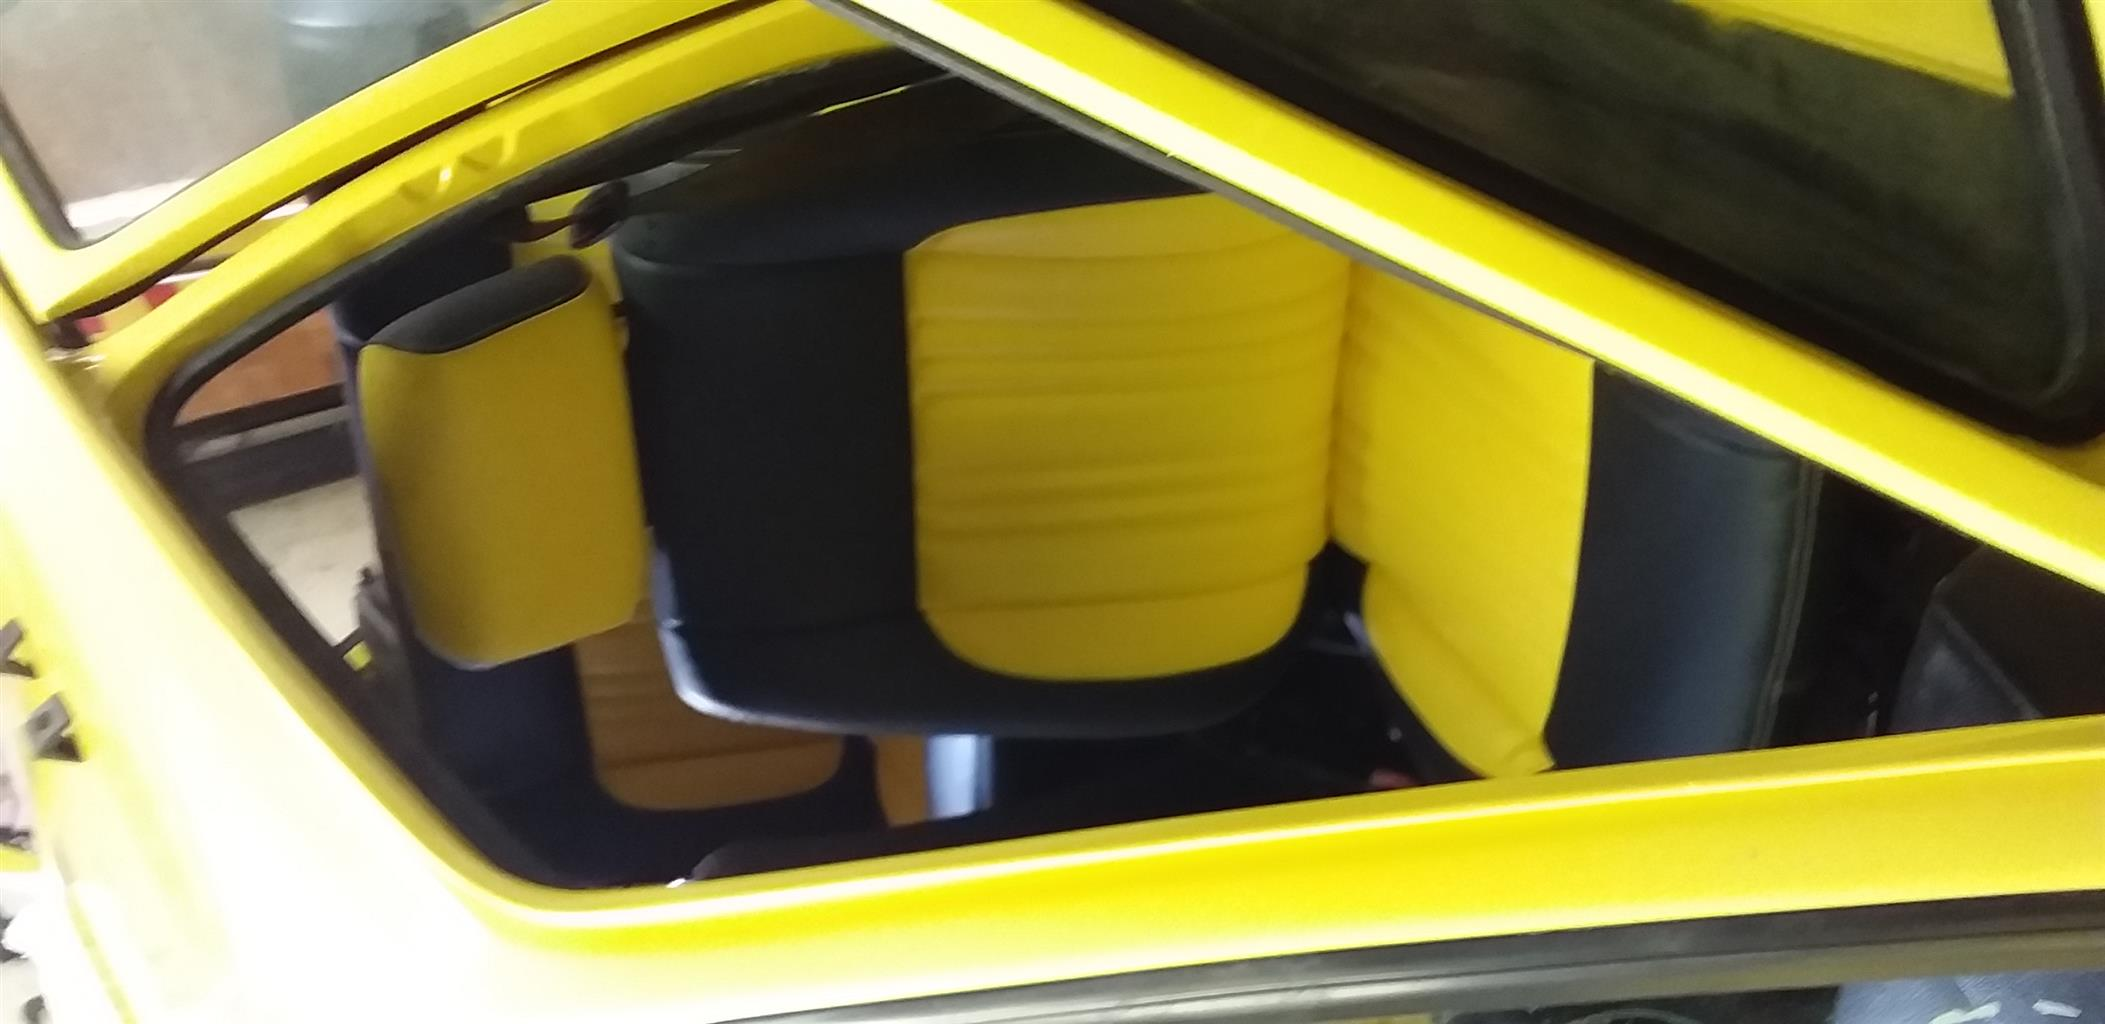 1989 VW Citi CITI 1.4i